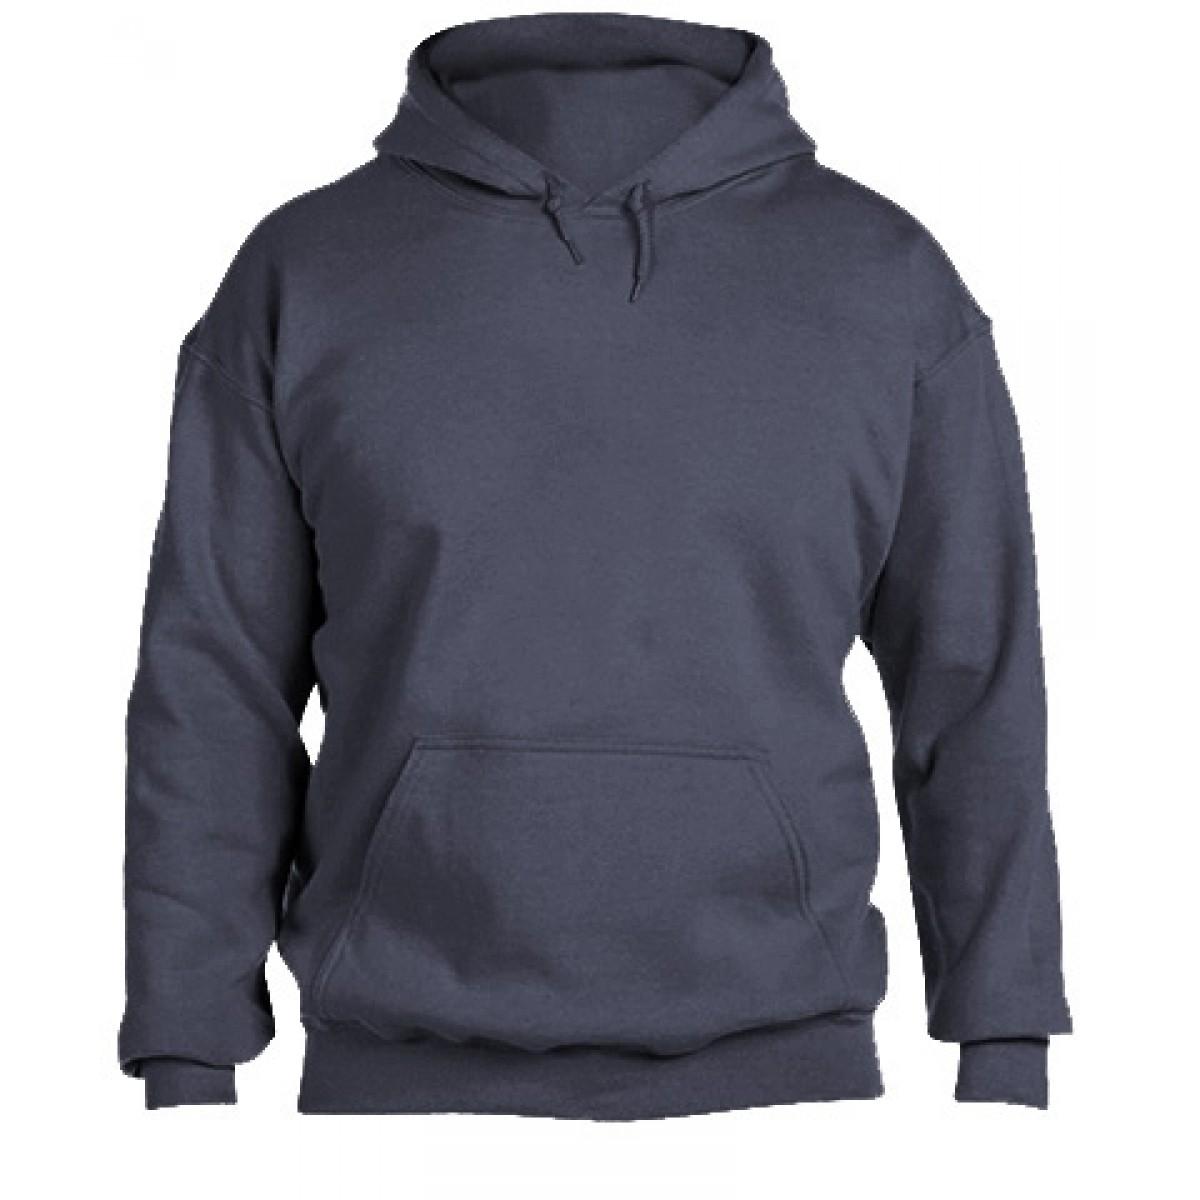 Solid Hooded Sweatshirt  50/50 Heavy Blend-Heather Navy-3XL